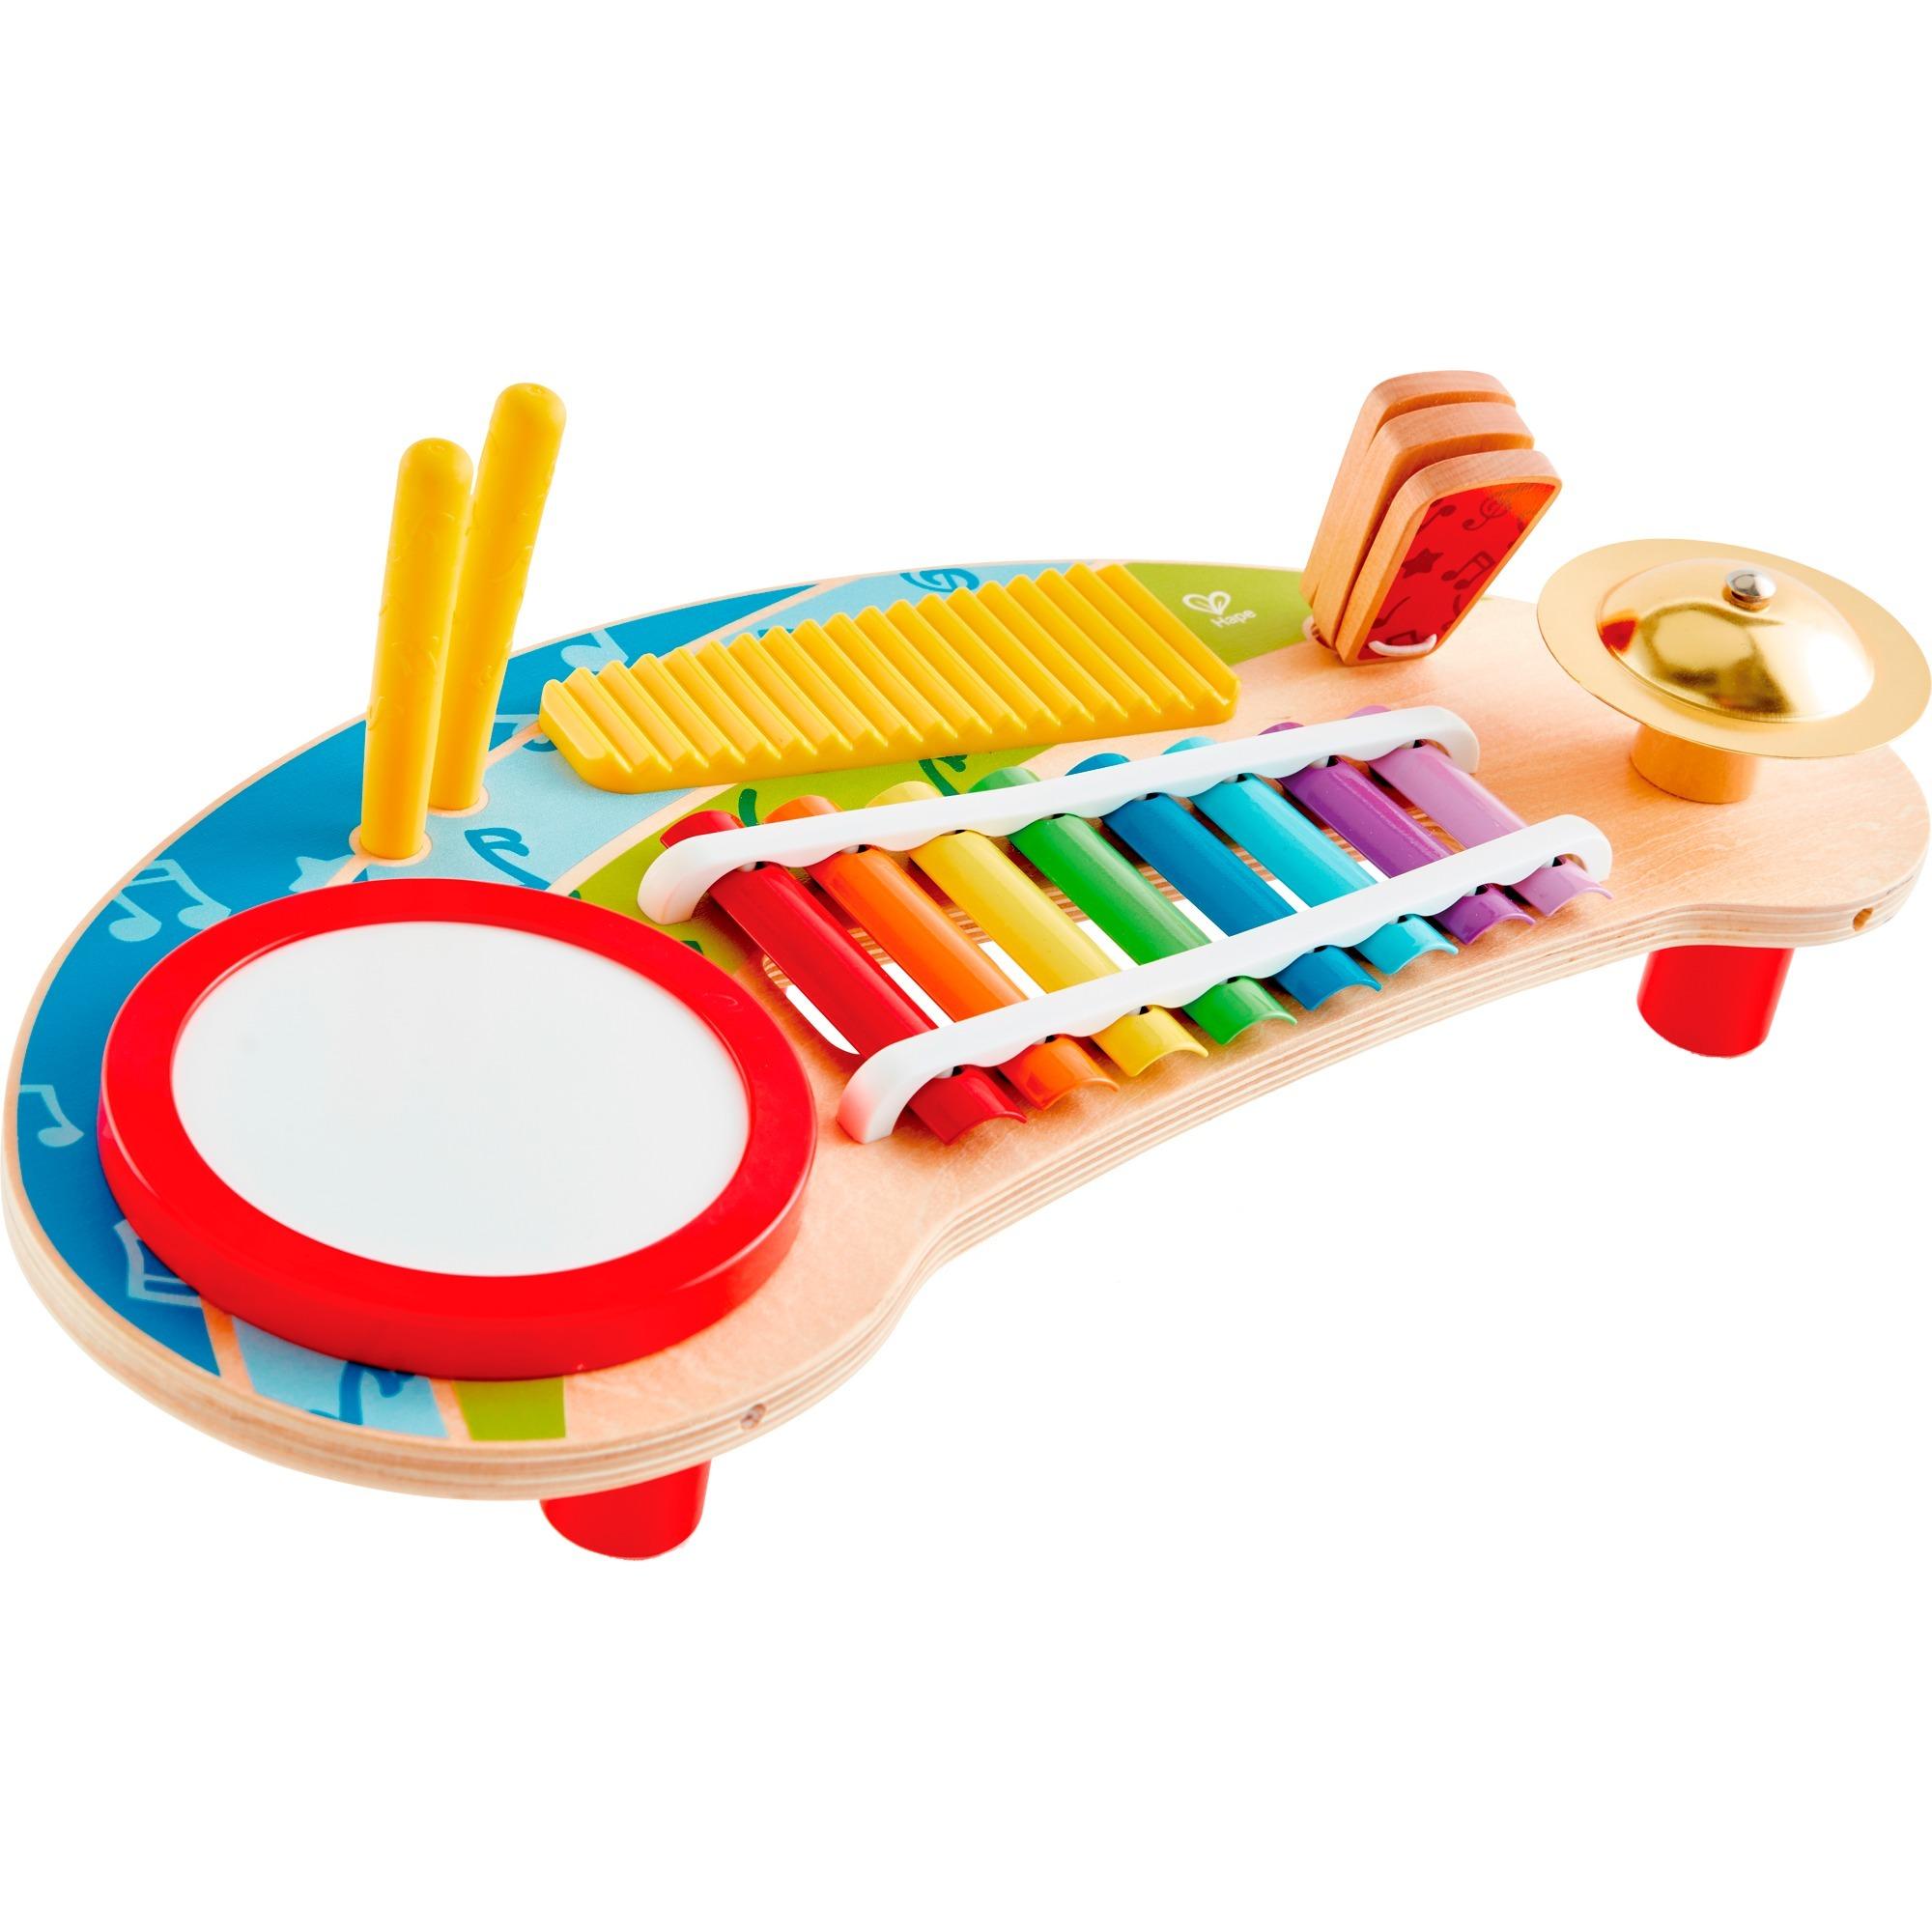 E0612, Juguetes musicales